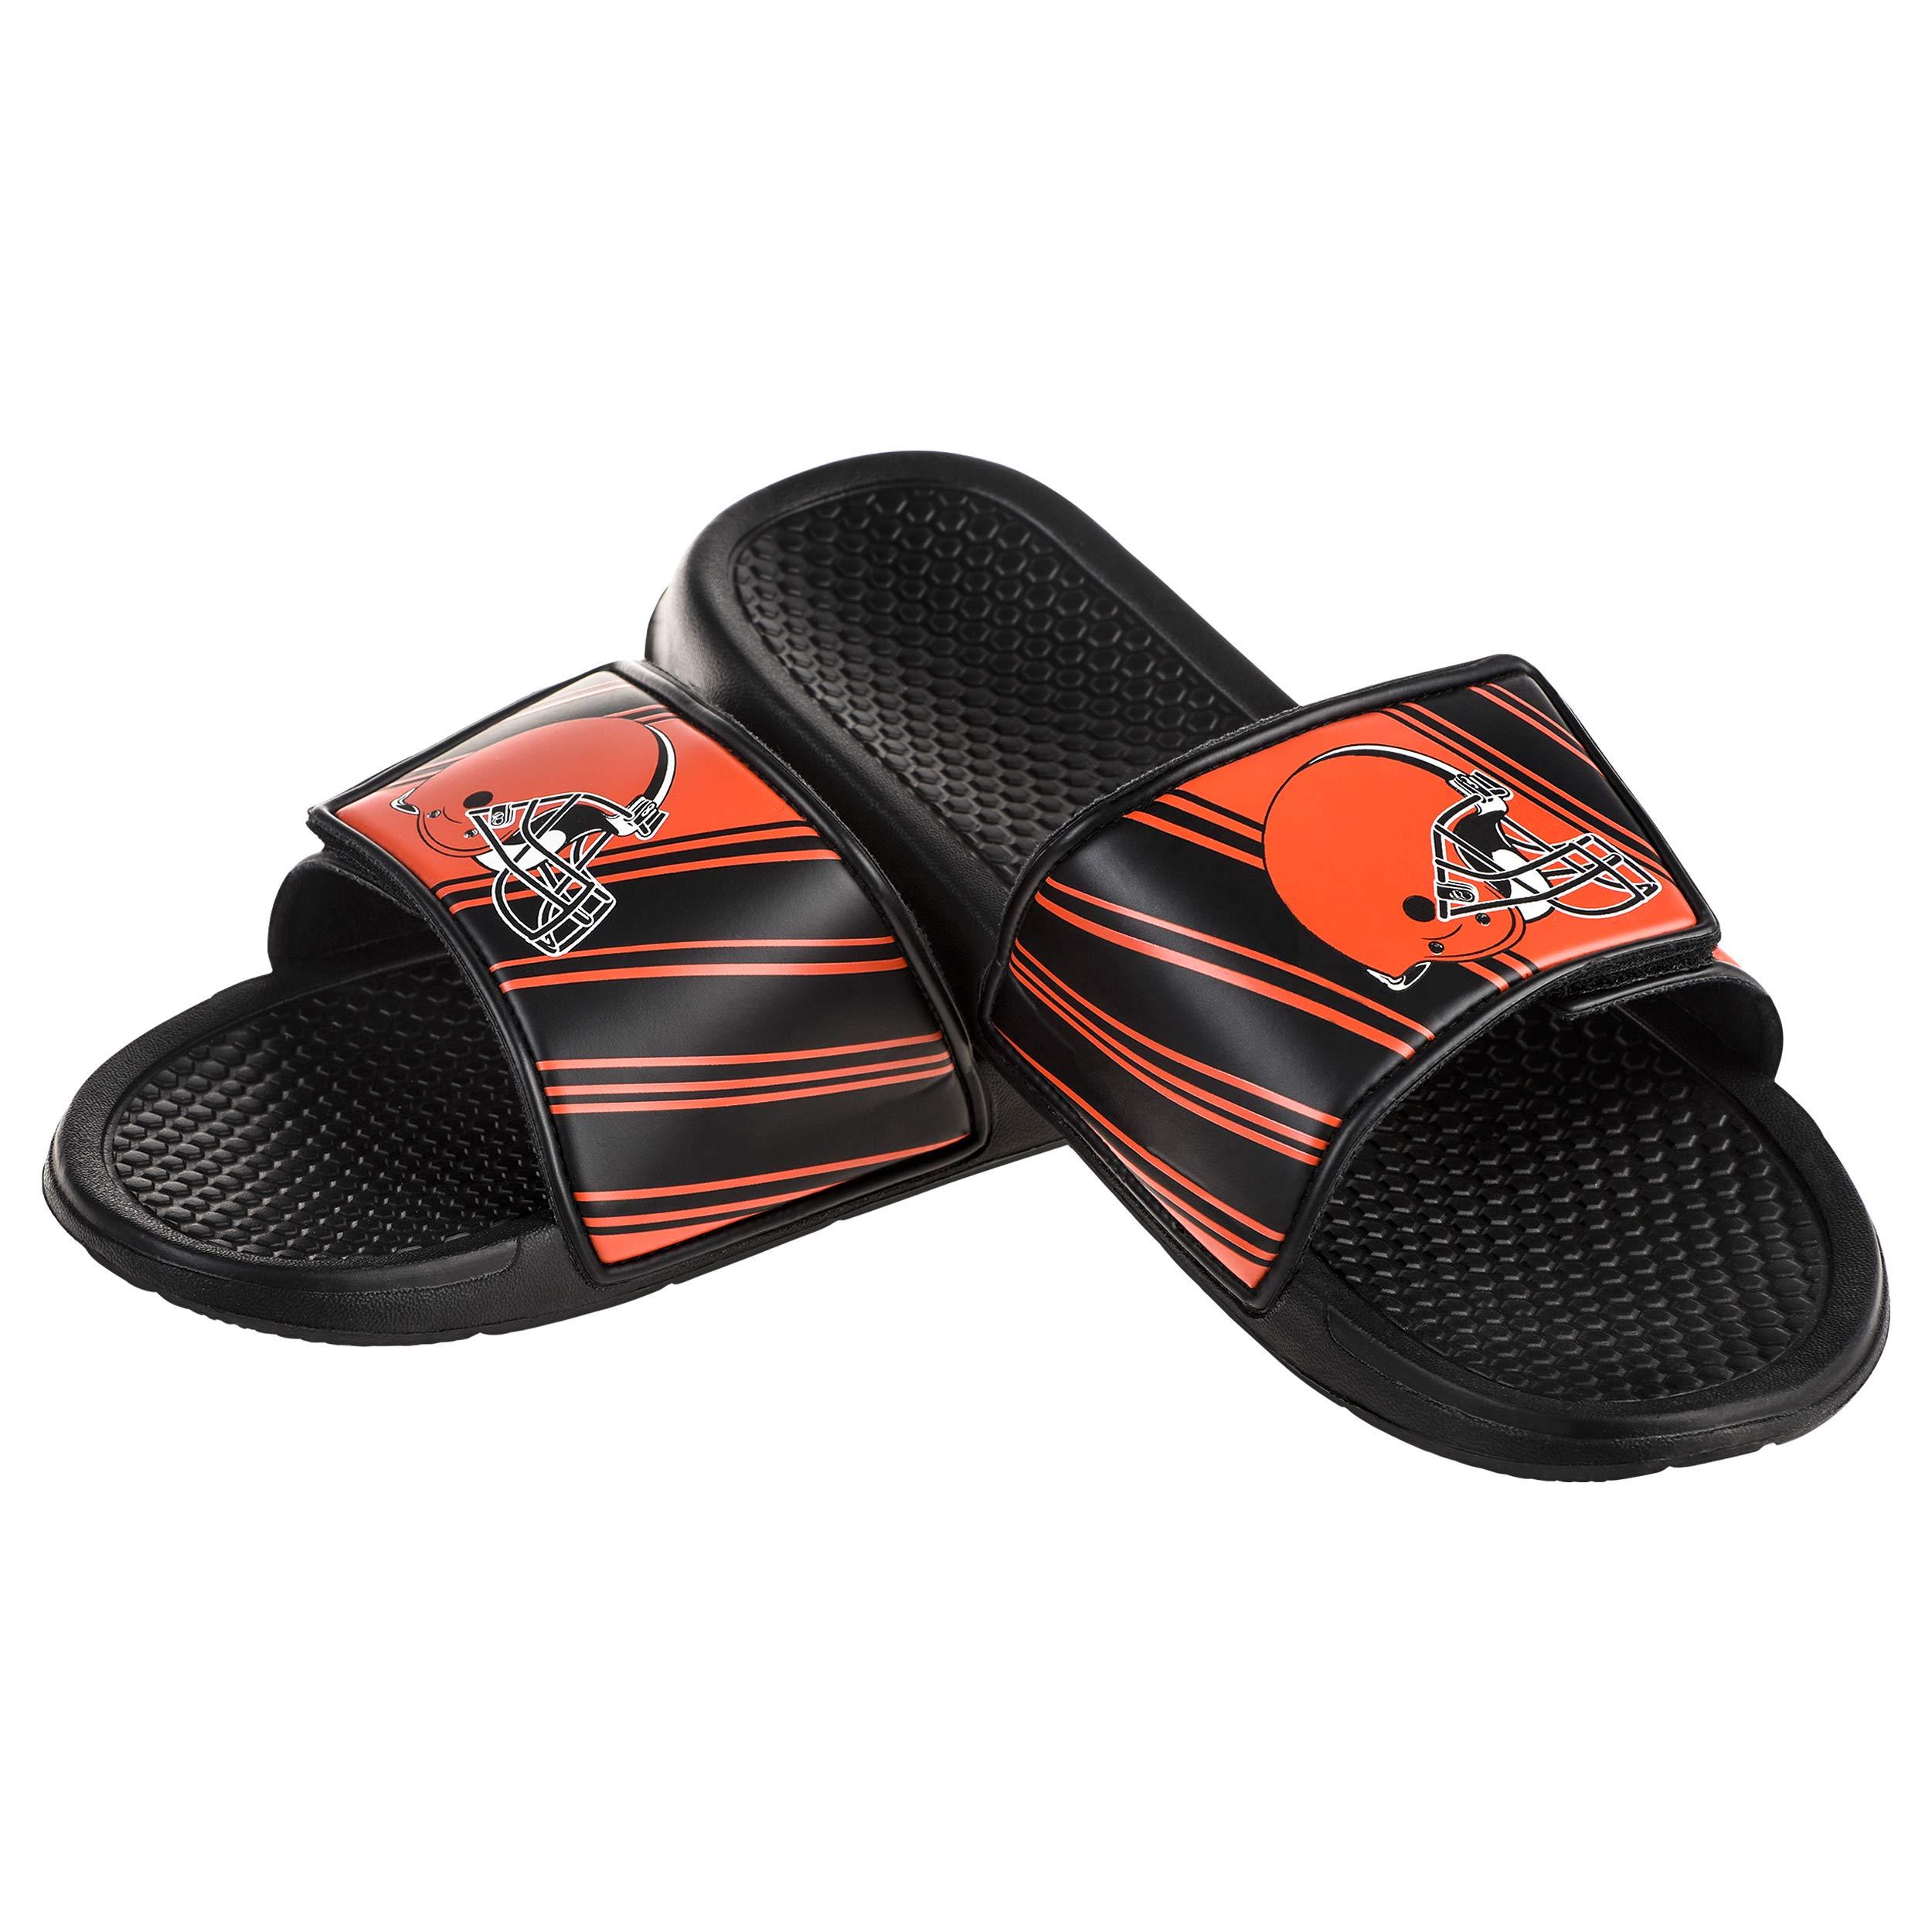 60e2e44ba04b2 Best Rated in Sports Fan Sandals   Helpful Customer Reviews - Amazon.com